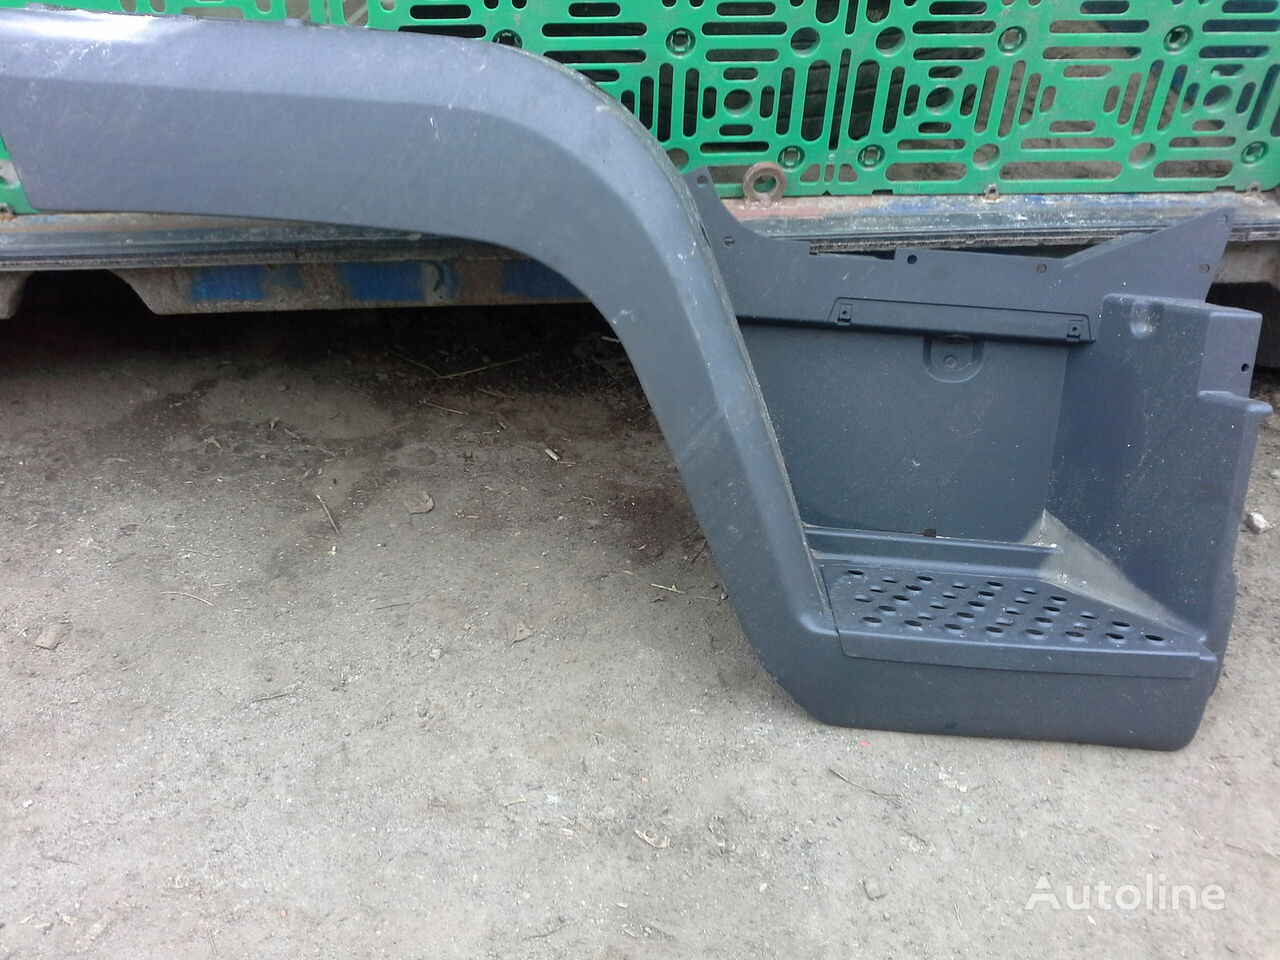 astmelaud MAN Podnozhka, krylo, podkrylnik tüübi jaoks veoauto MAN L2000